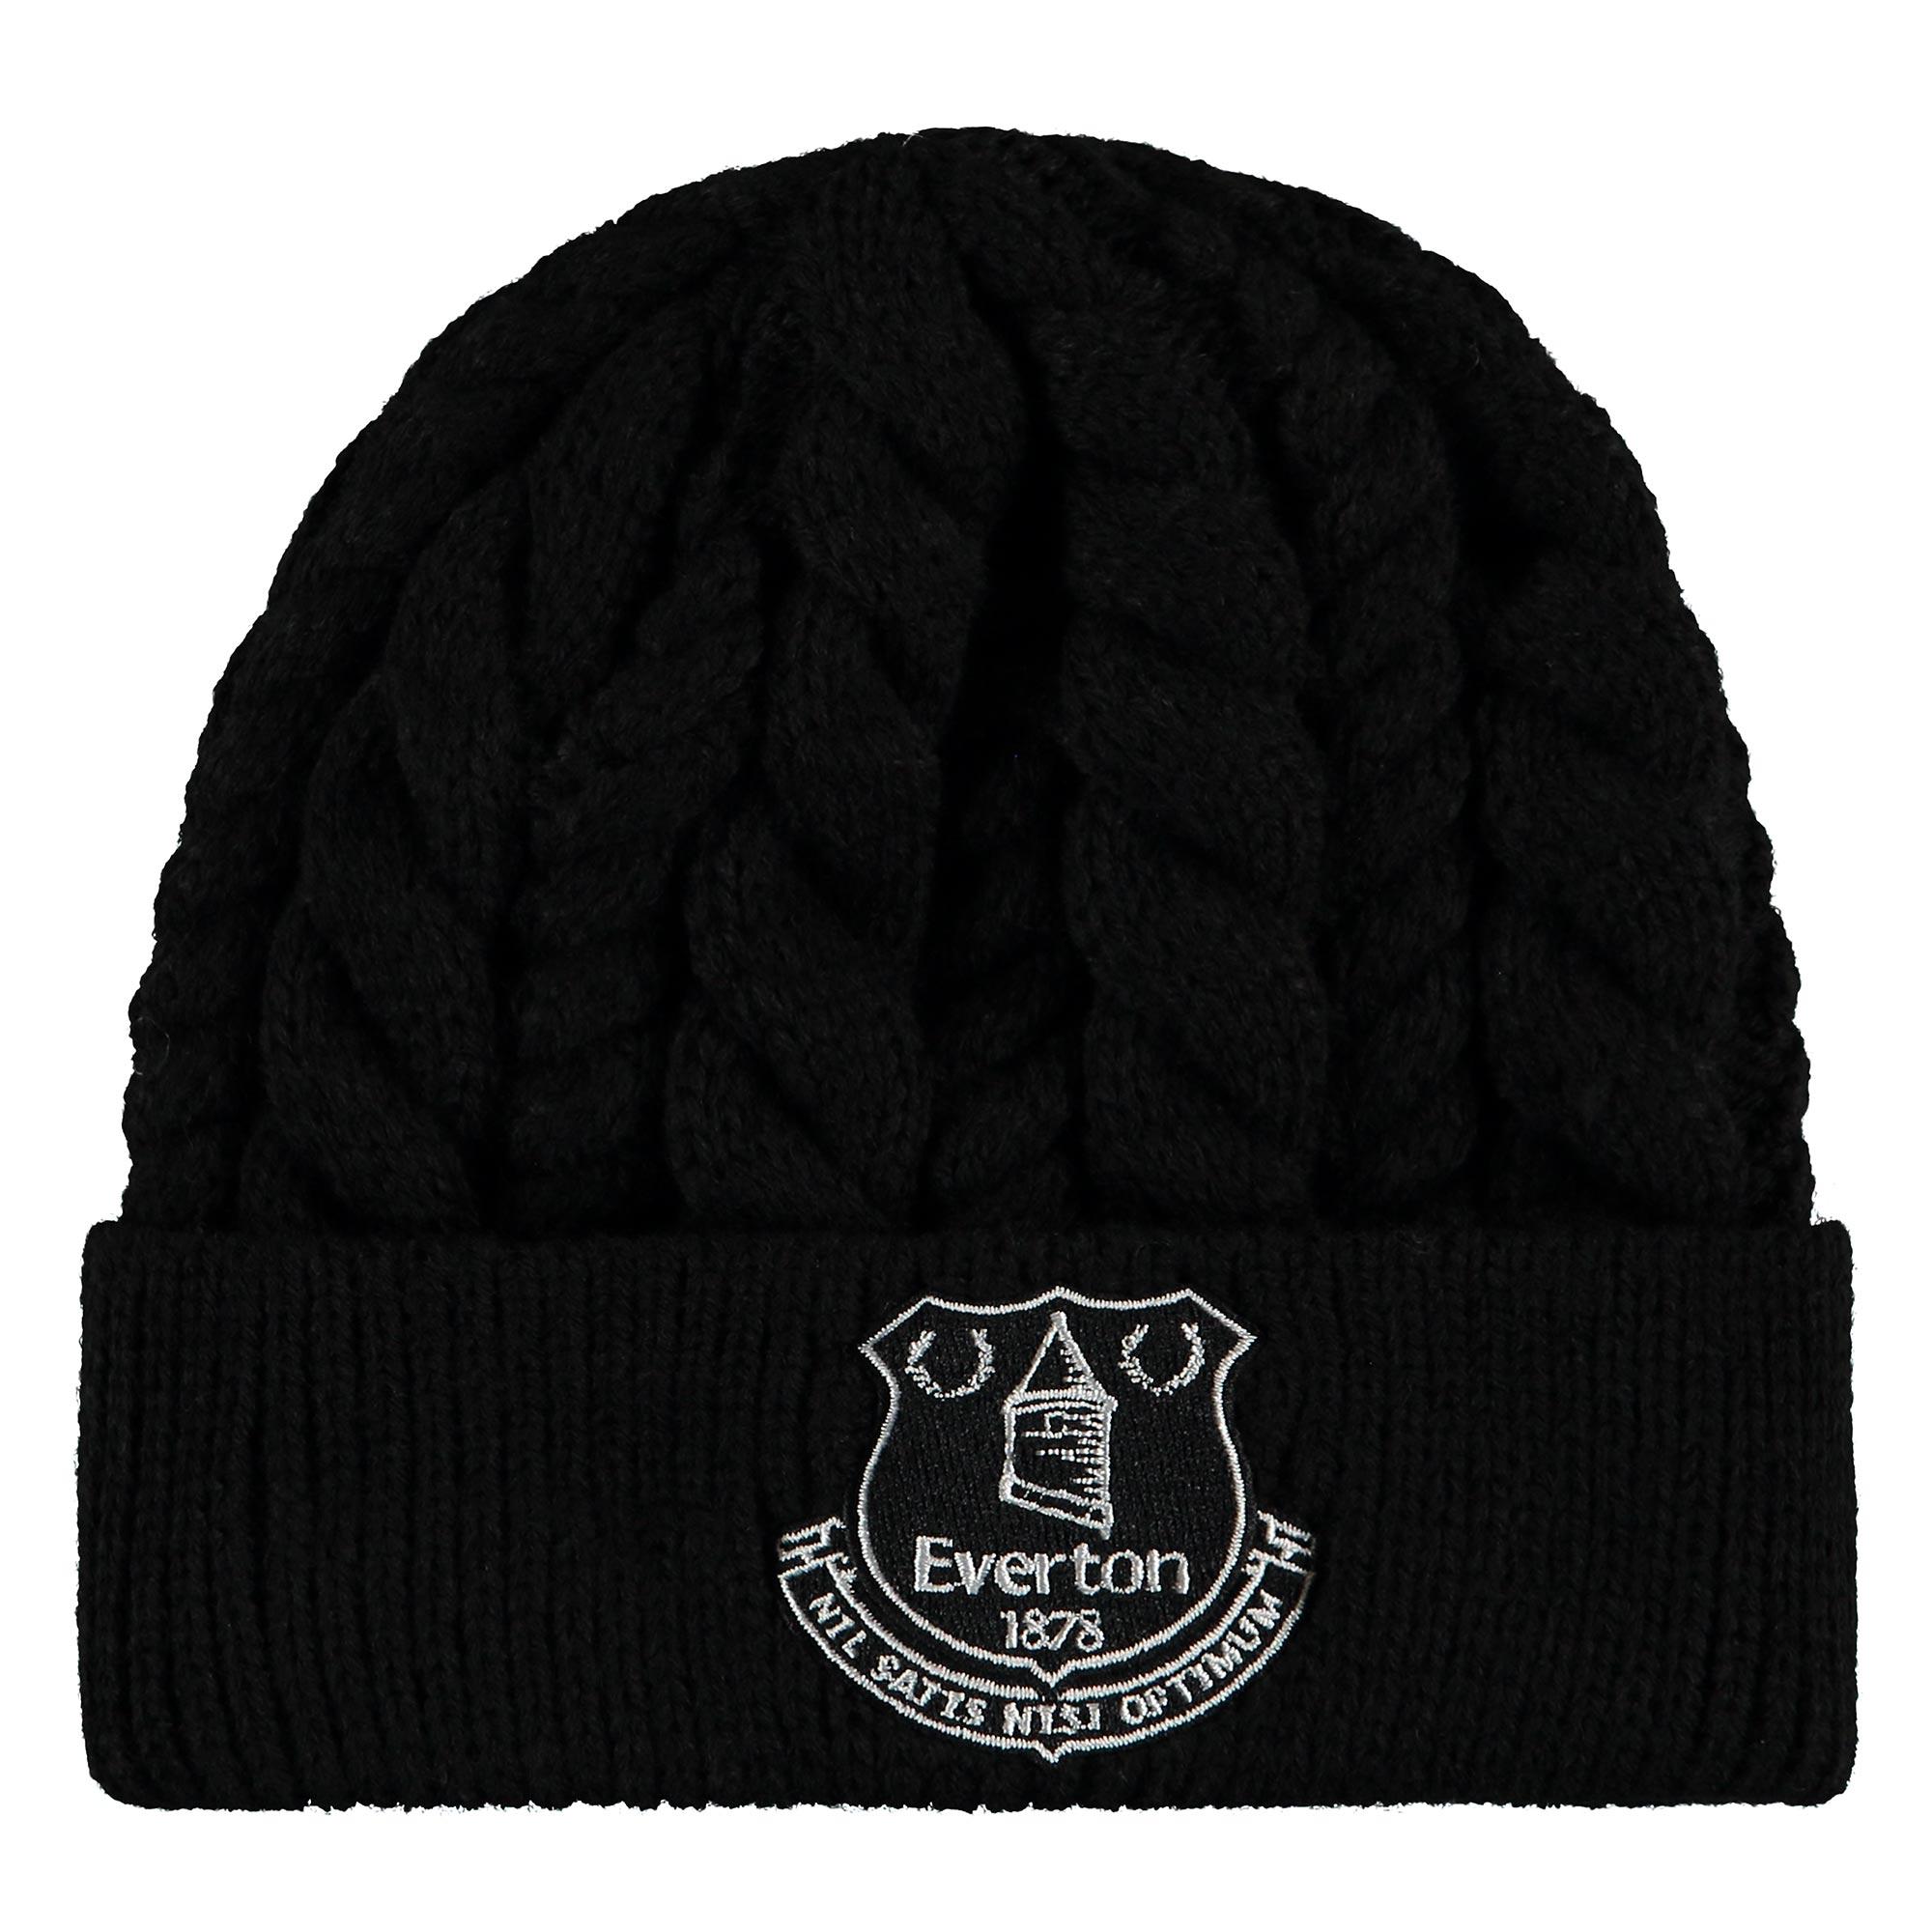 Everton New Era Fishermans Beanie - Black